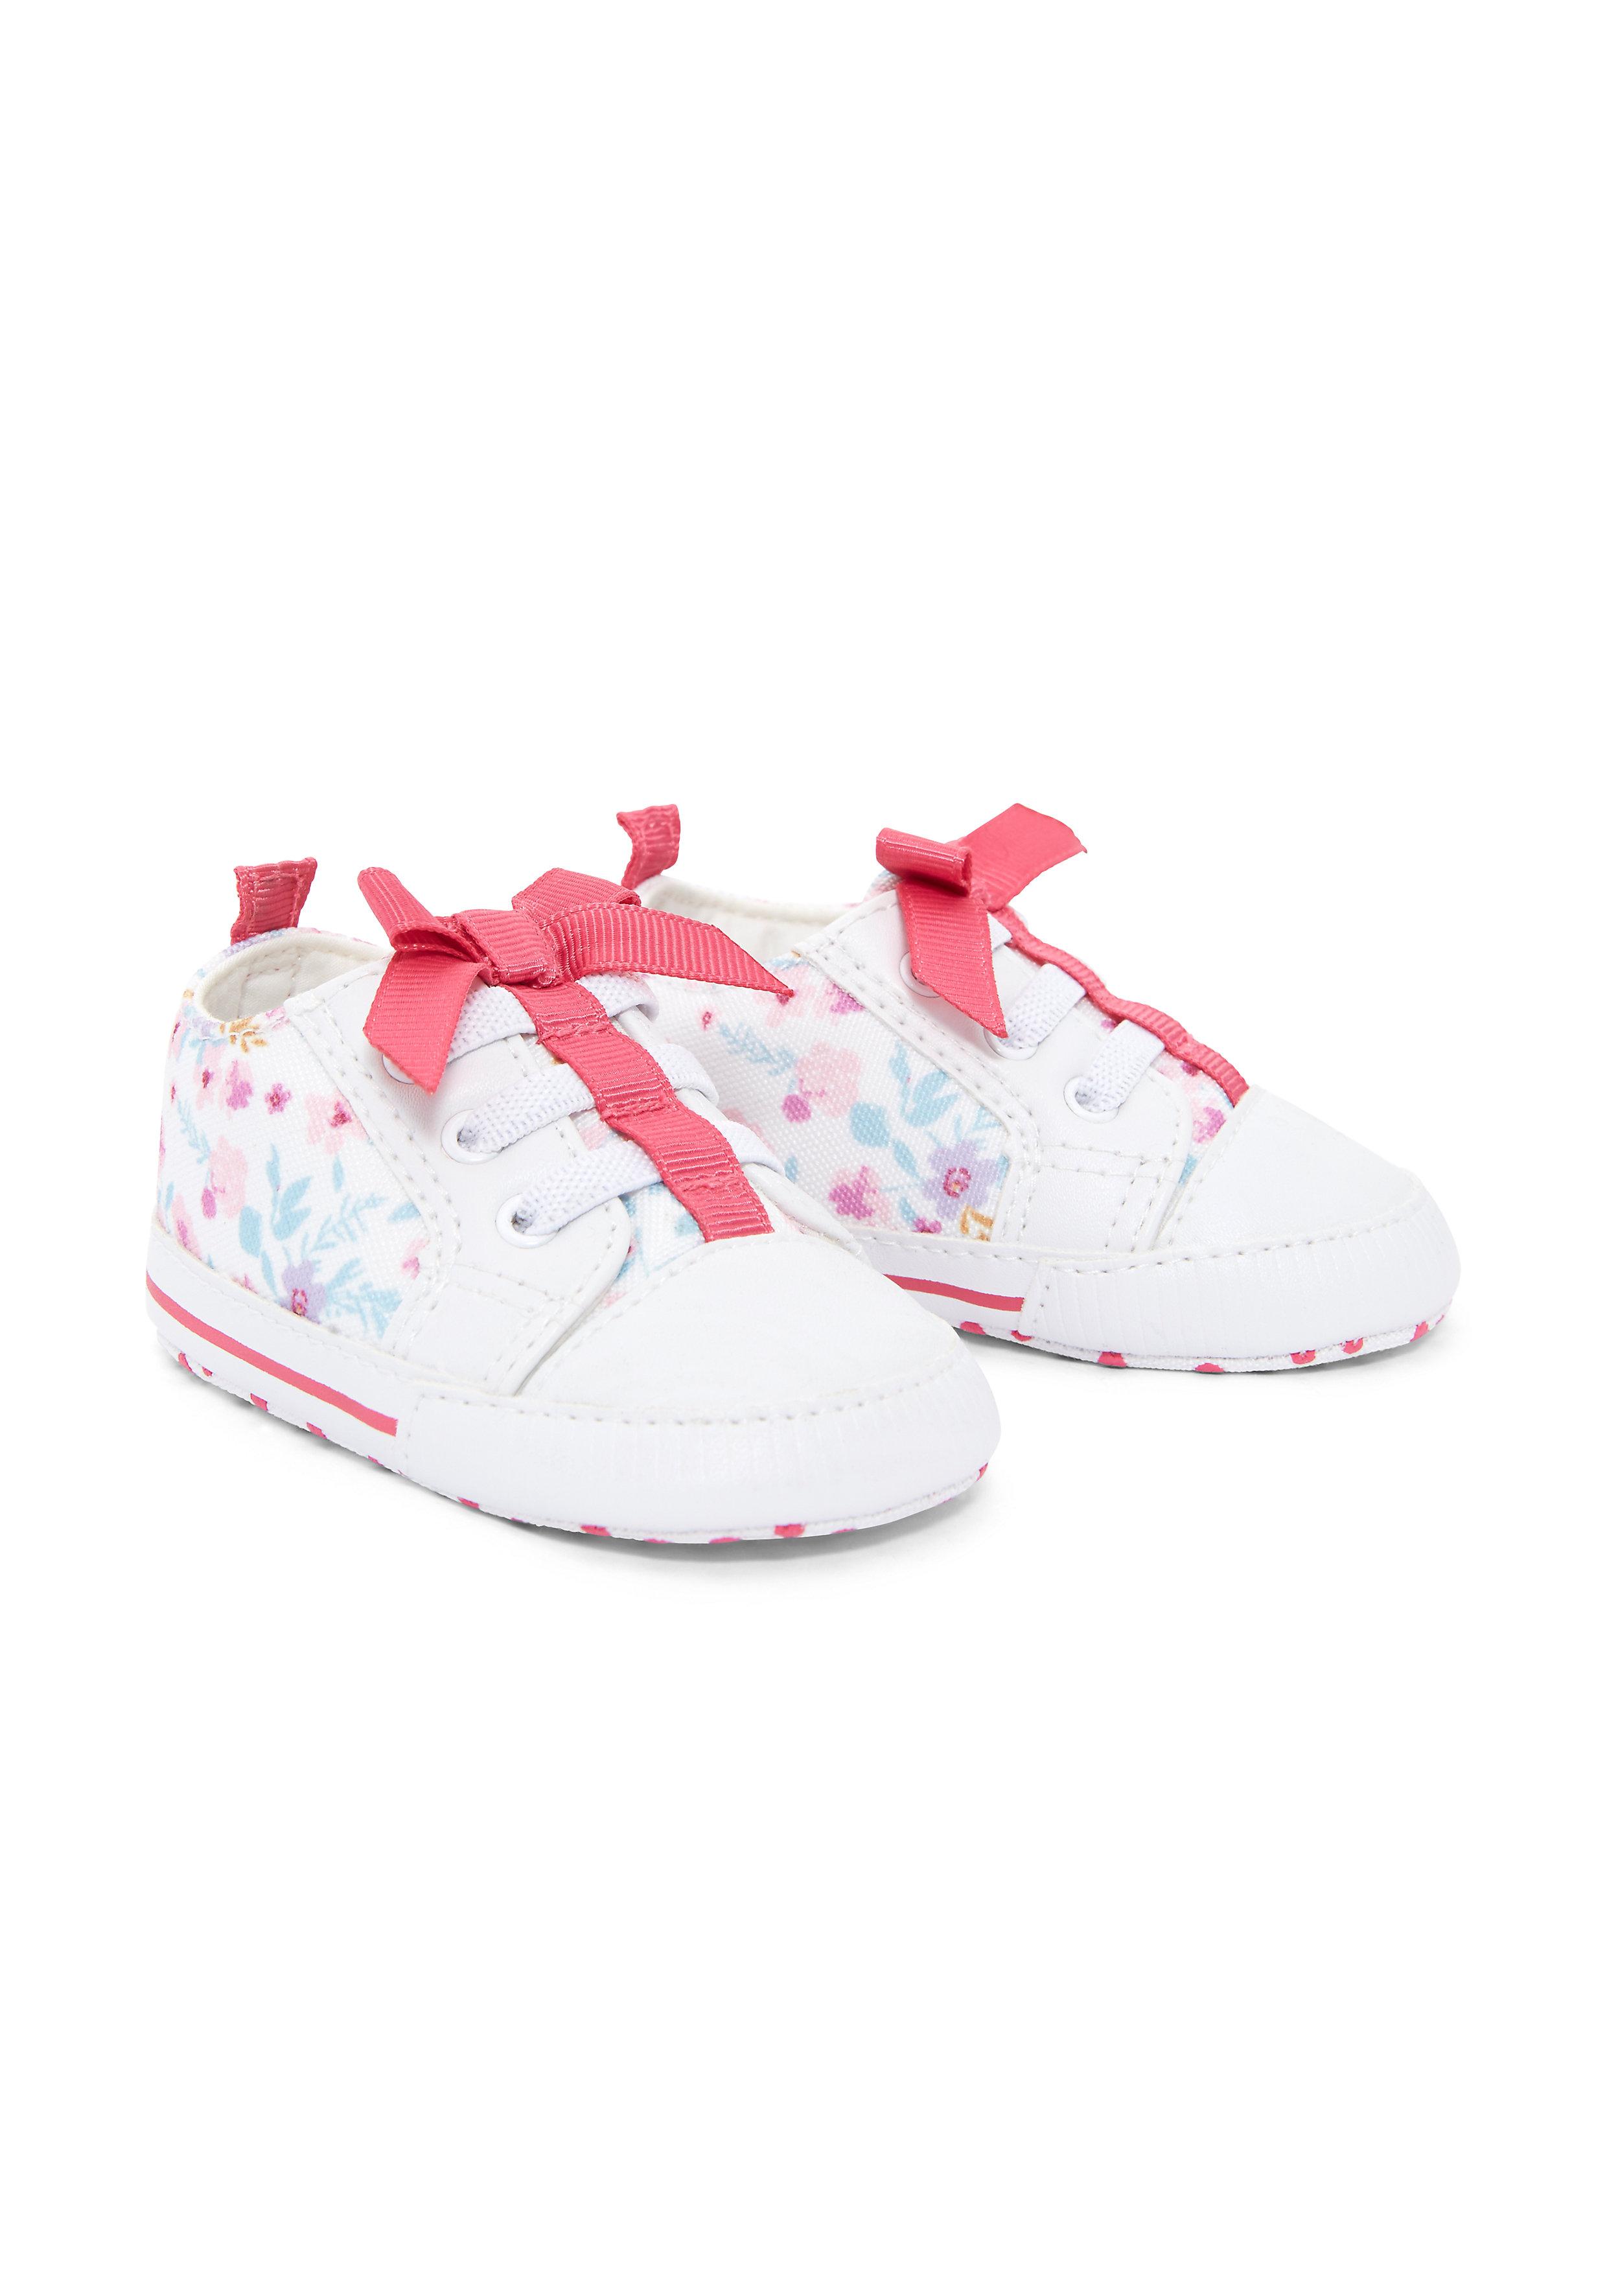 Mothercare | Girls Pram Shoes Bow Detail - White